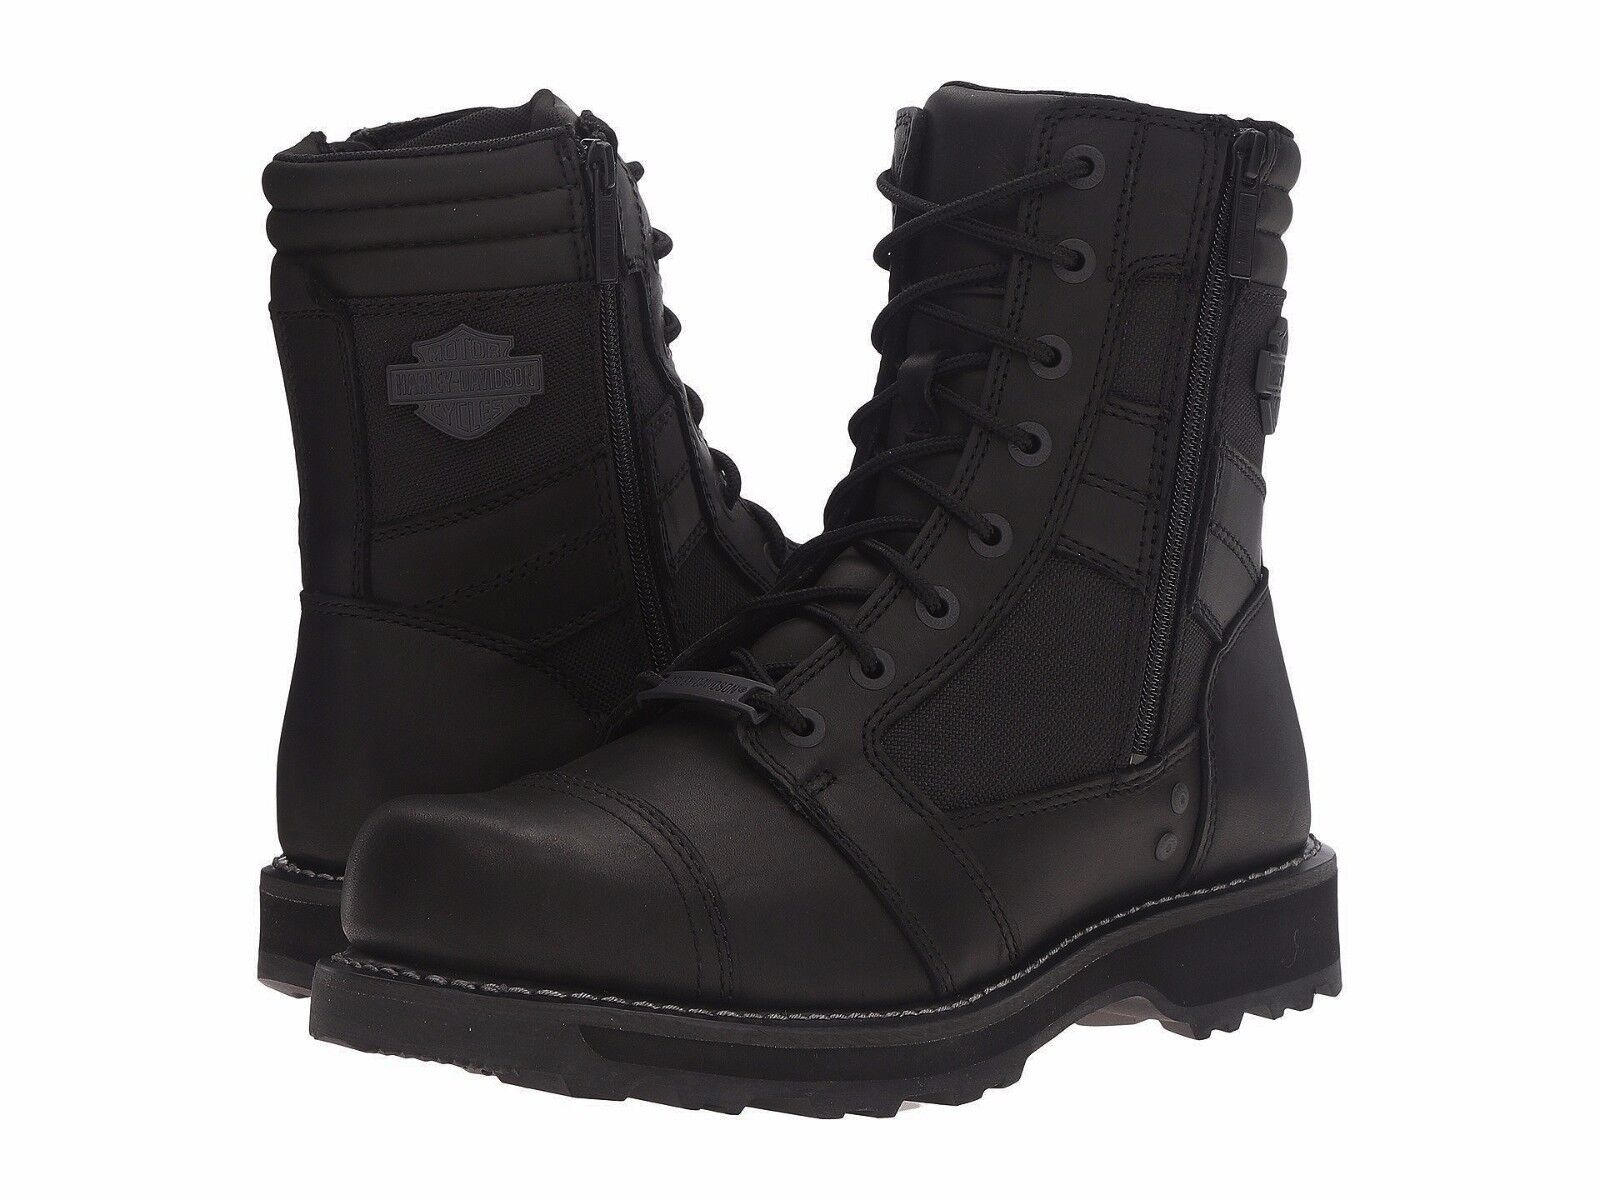 169 NEW NIB Harley Davidson Boxbury Mens Black Leather Motorcycle Boots D93770